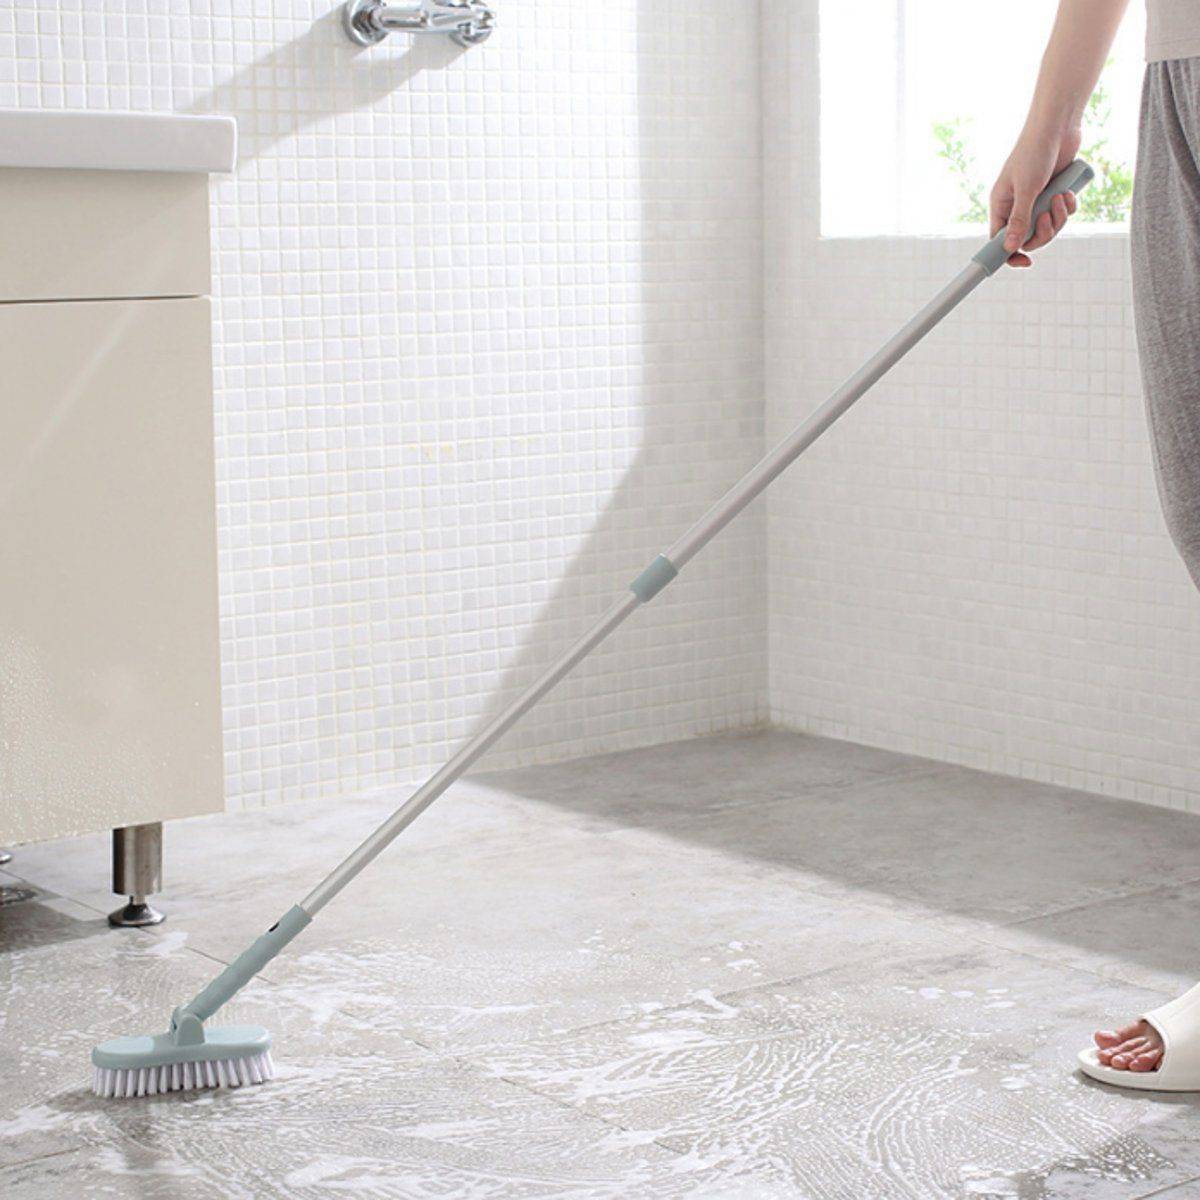 Retractable Bathroom Long Handle Brush Wall Floor Scrub Bathtub